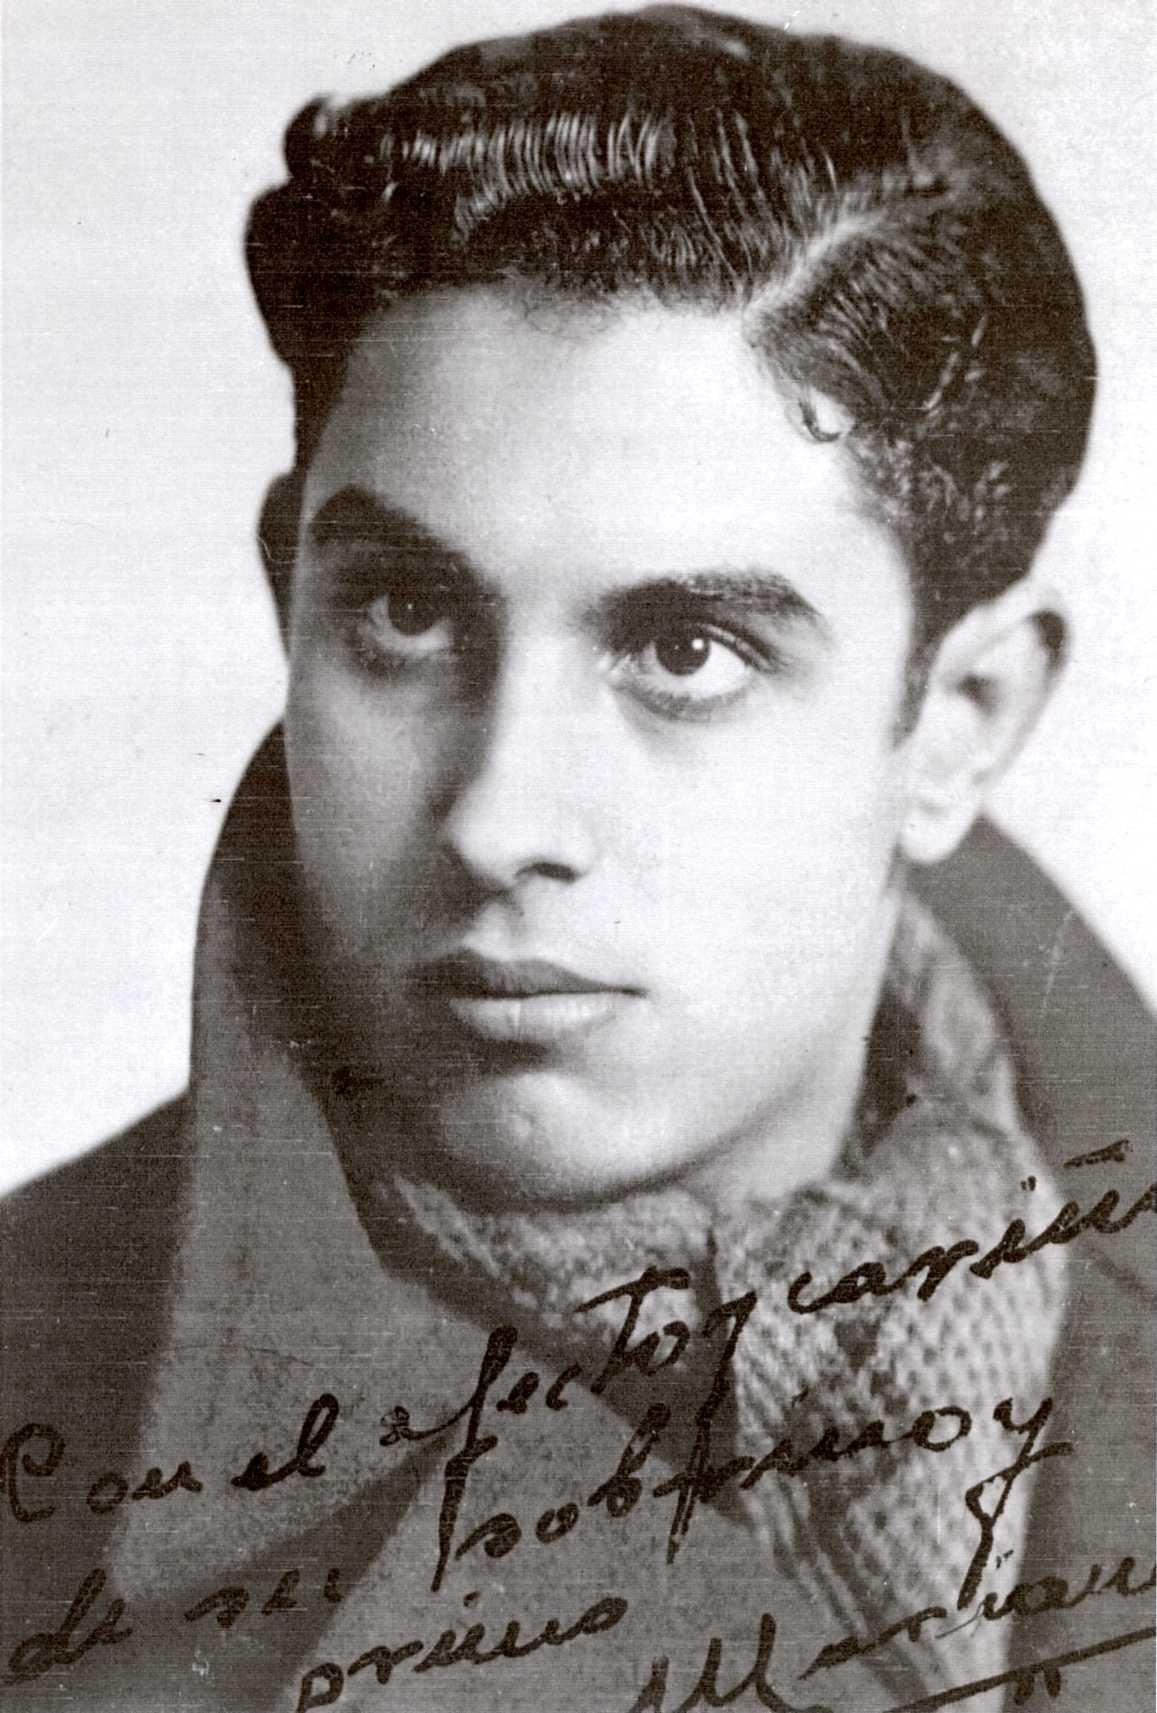 Mariano Aguayo Morán